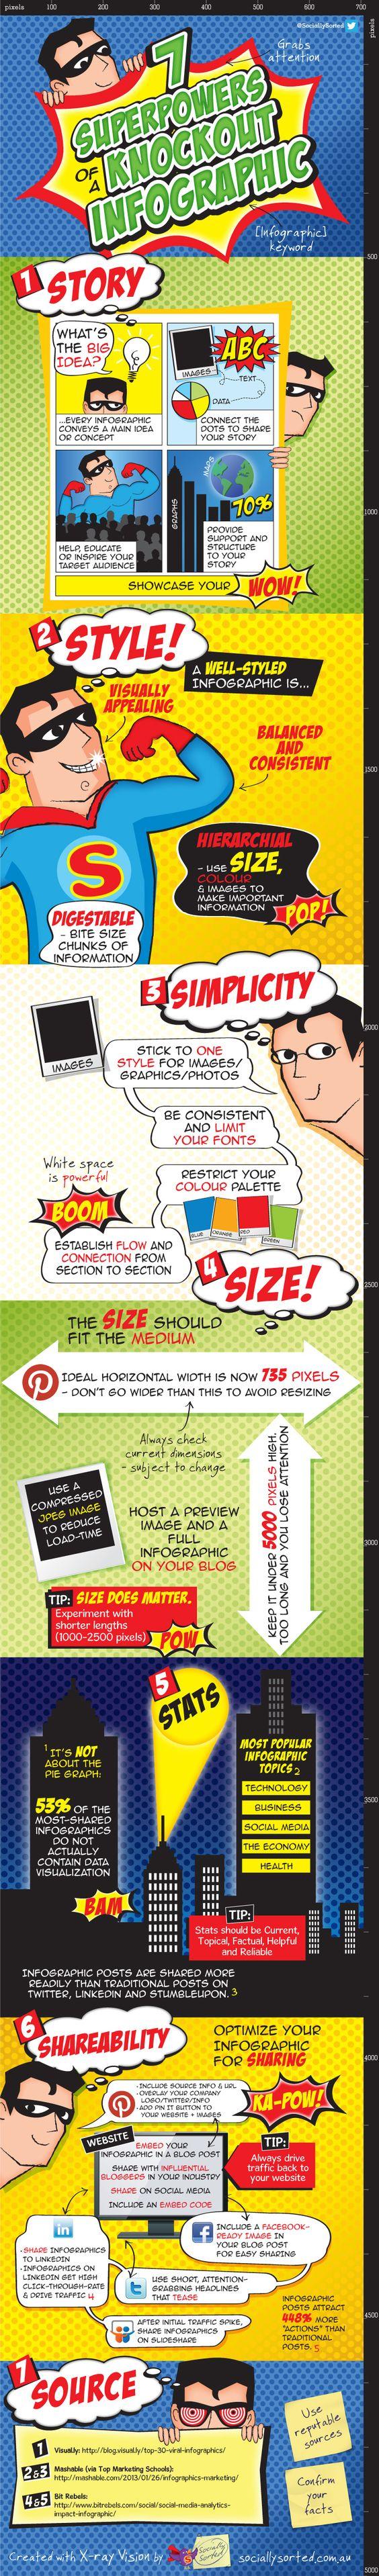 7 superpoderes de una impactante infografía vía: sociallysorted.com.au #infografia #infographic #marketing